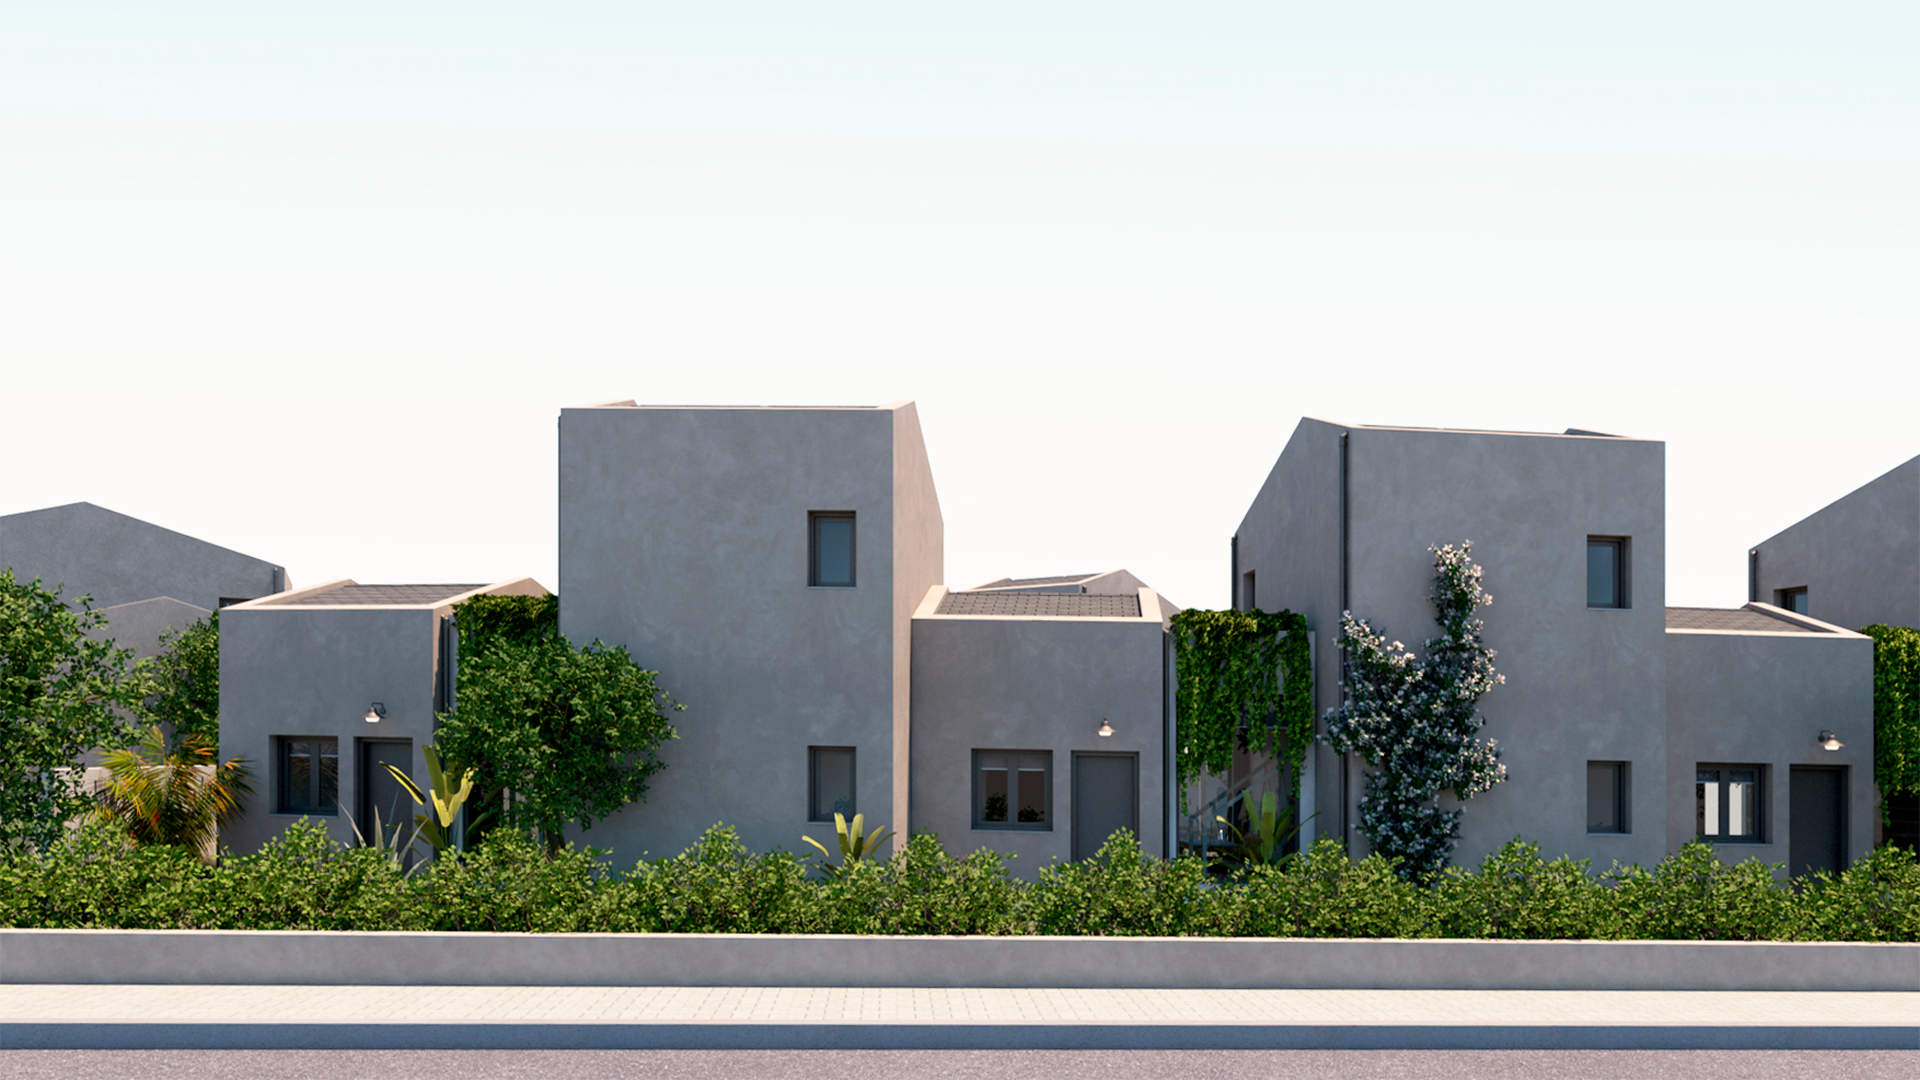 villas complex, exterior design, facades, entrances, landscaping. Συγκρότημα τουριστικών κατοικιών, εξωτερικές διαμορφώσεις, όψεις, είσοδοι, τοπίο.